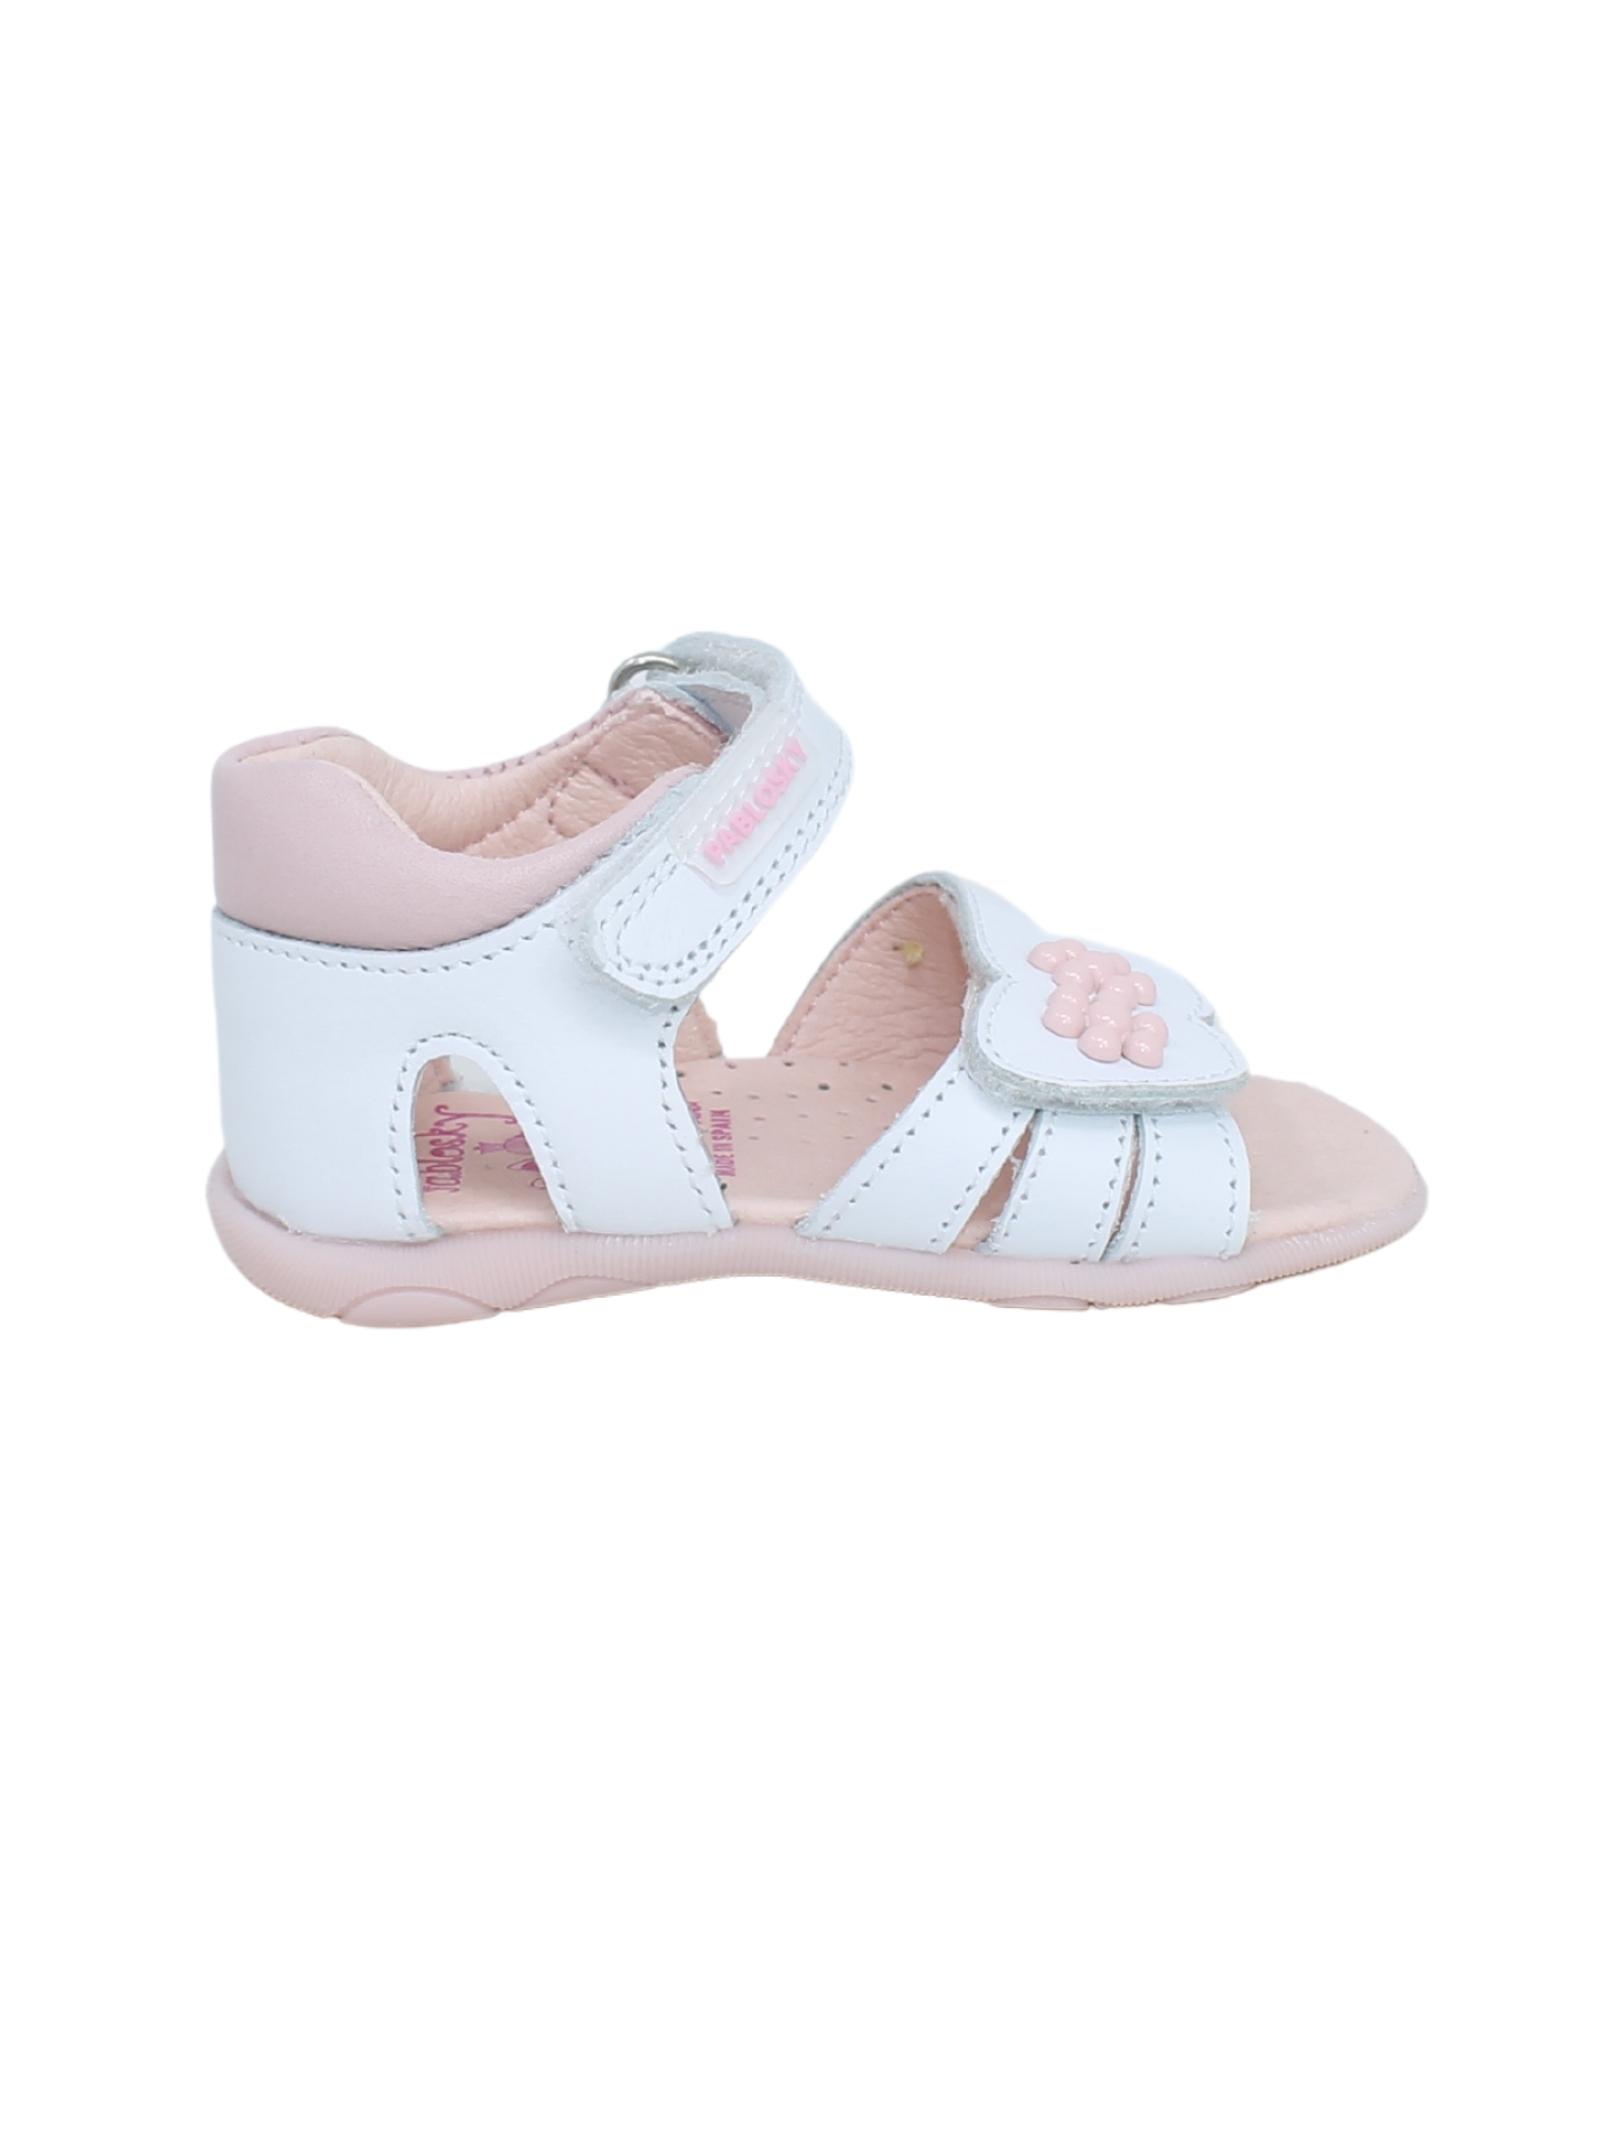 Sandalo Bambina Fiori Pink PABLOSKY | Sandali | 073407BIANCO